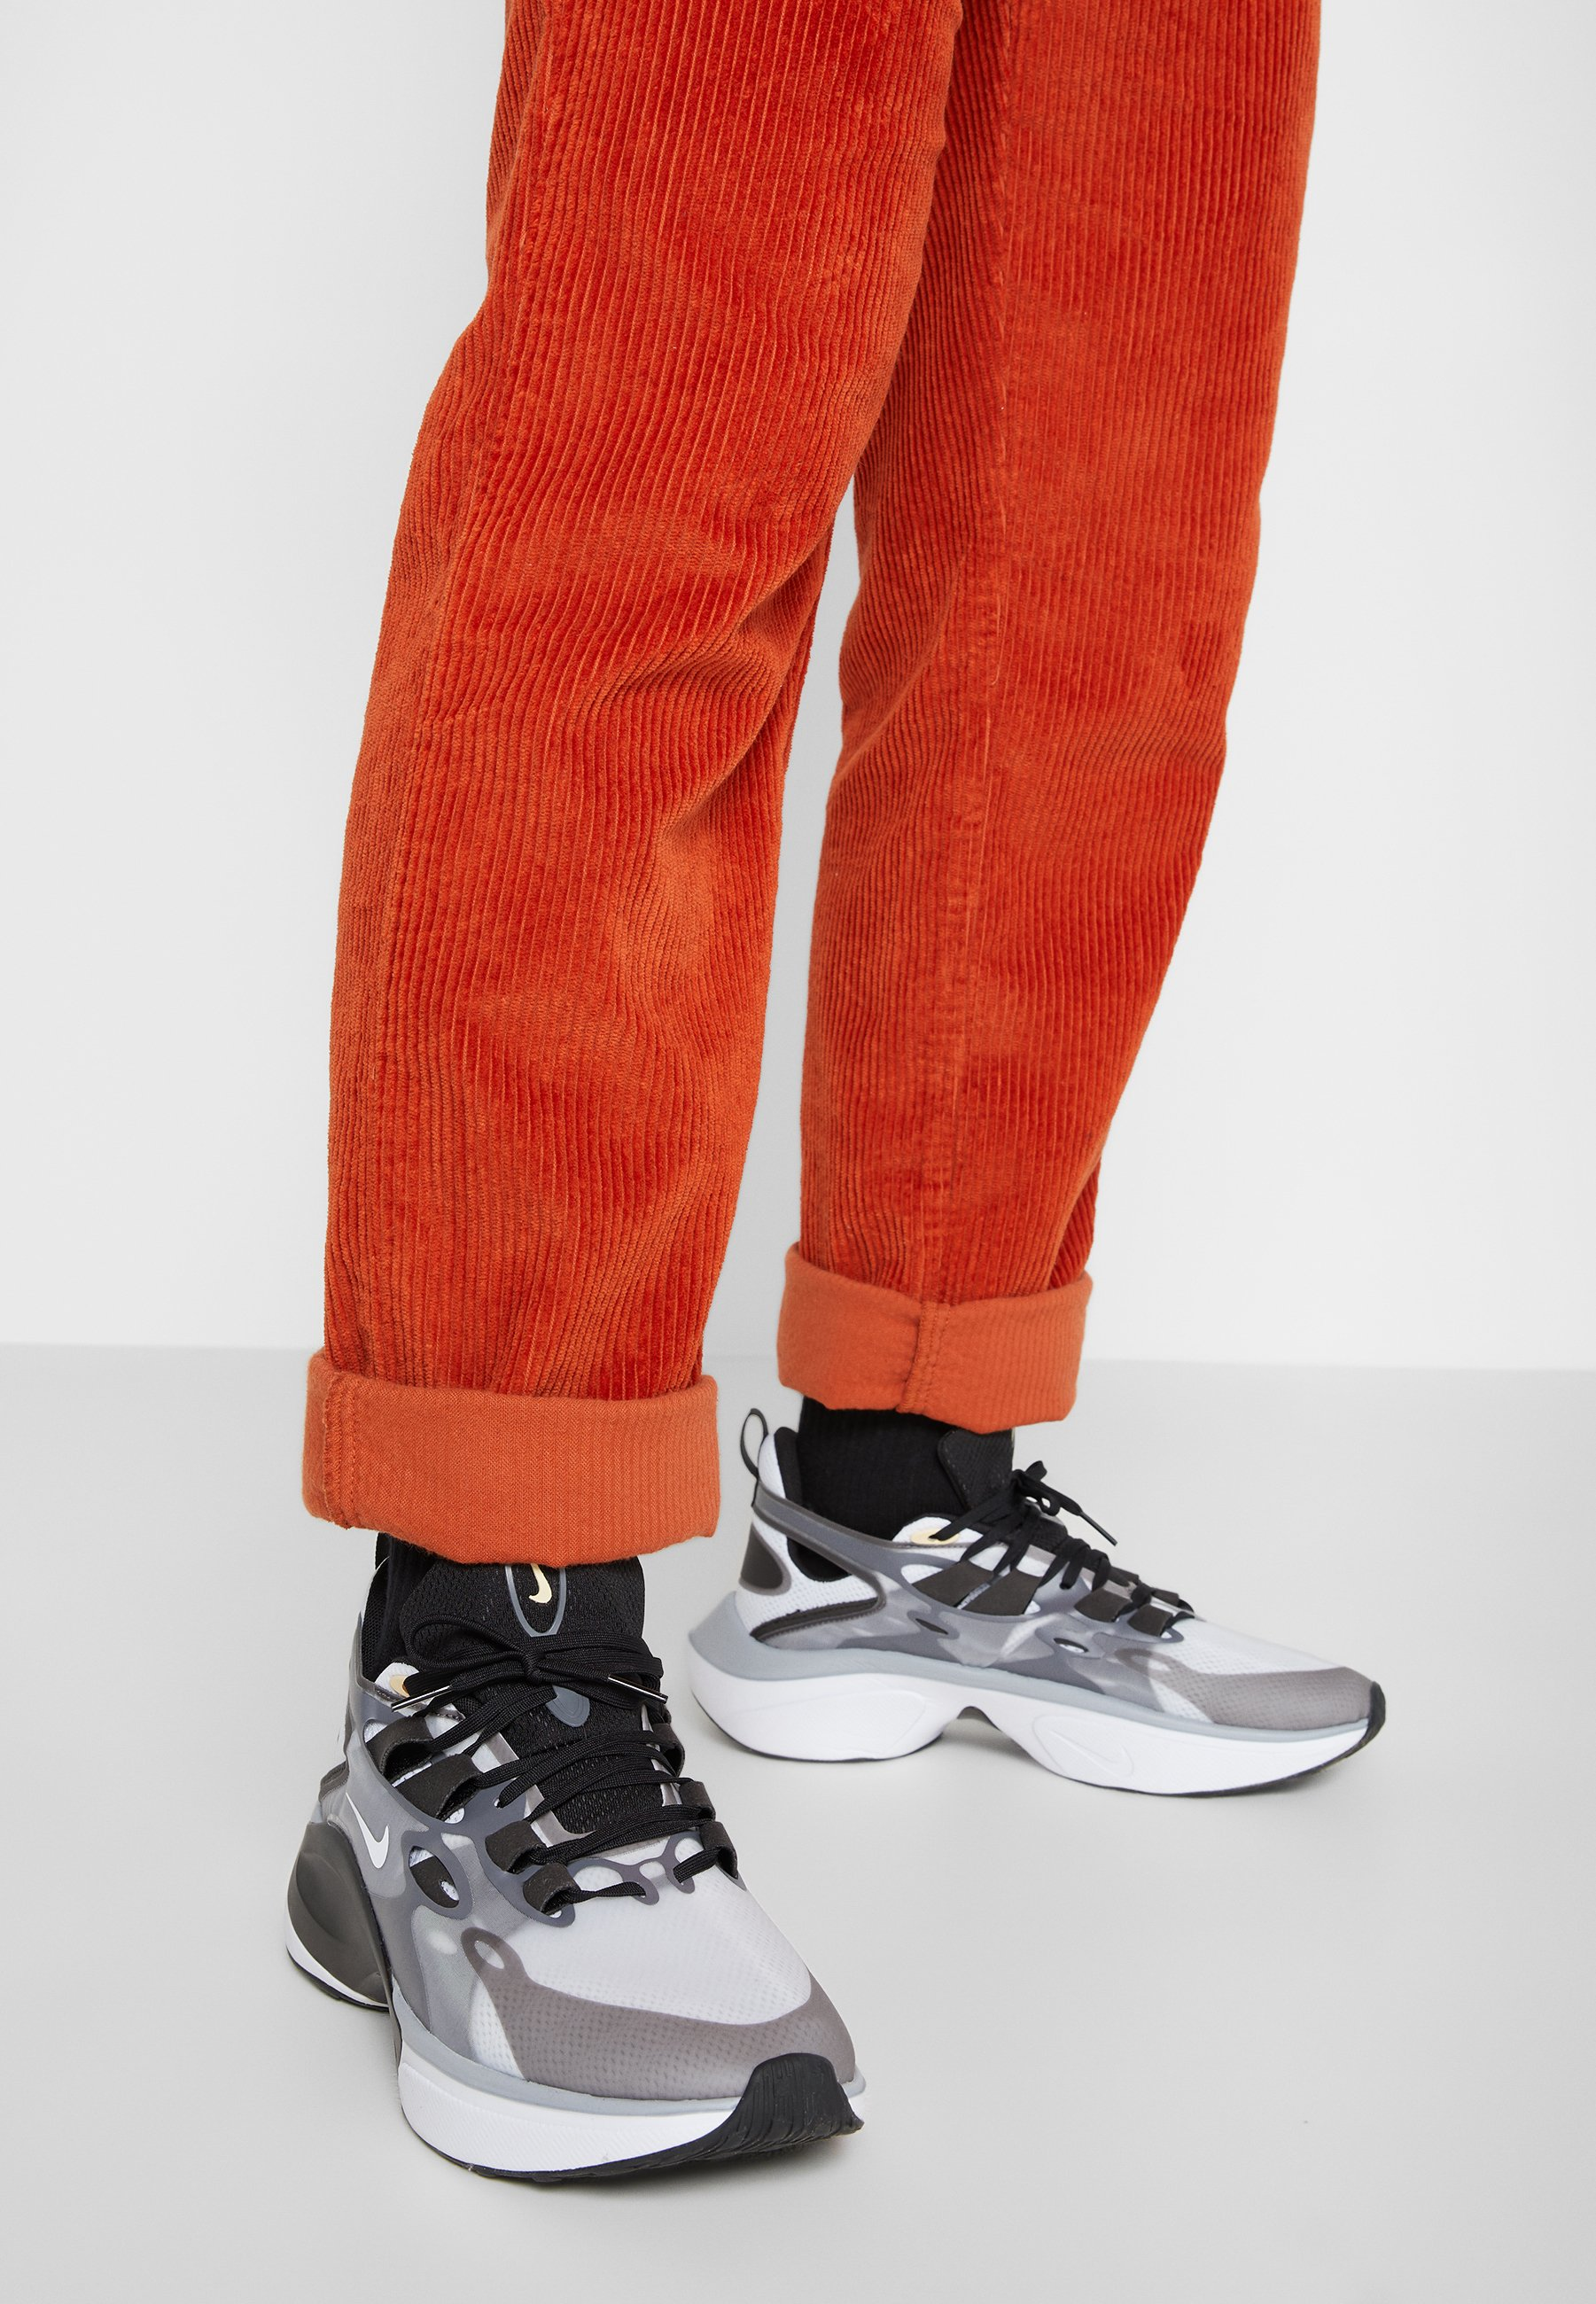 SIGNAL DMSX Sneaker low blackwhitefootball greypale vanillaanthracitevapor green